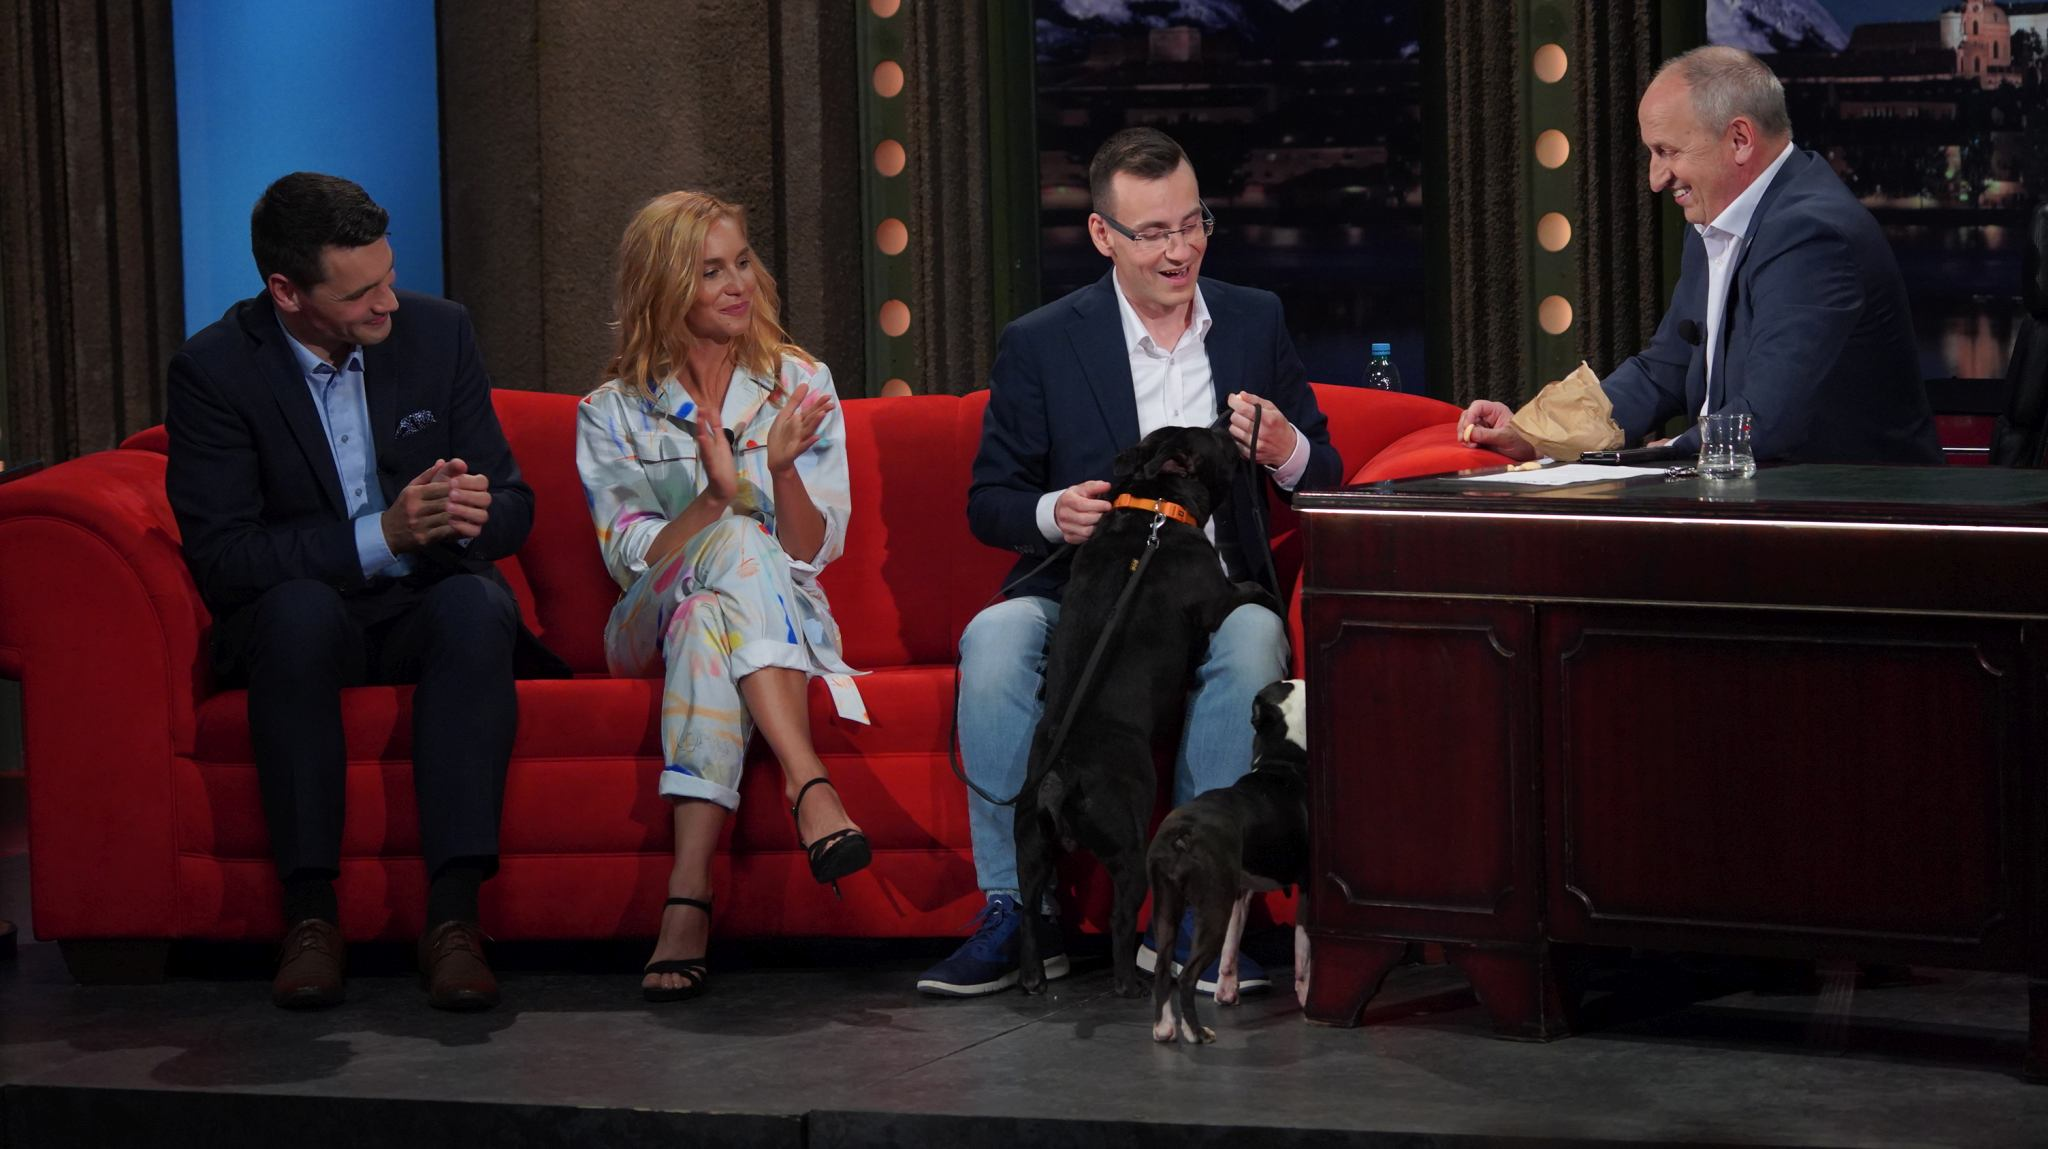 Zleva: Moderátor Daniel Stach, herečka Hana Vagnerová a cvičitel psů Robert Zlocha v SJK 19. 5. 2021